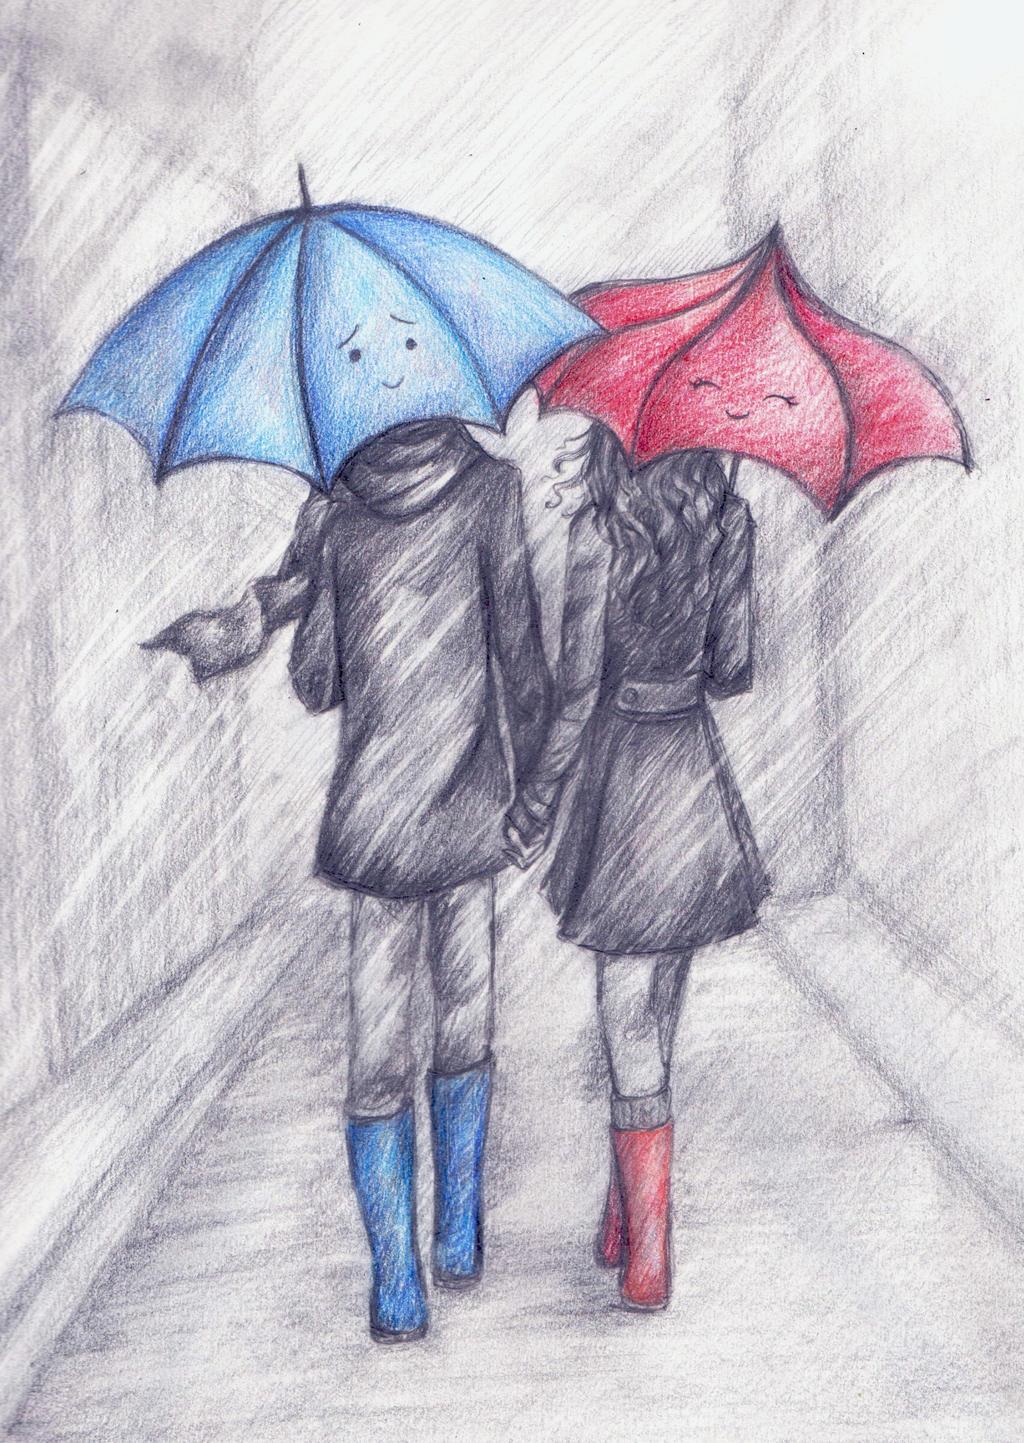 The Blue Umbrella By La Chapeliere Folle